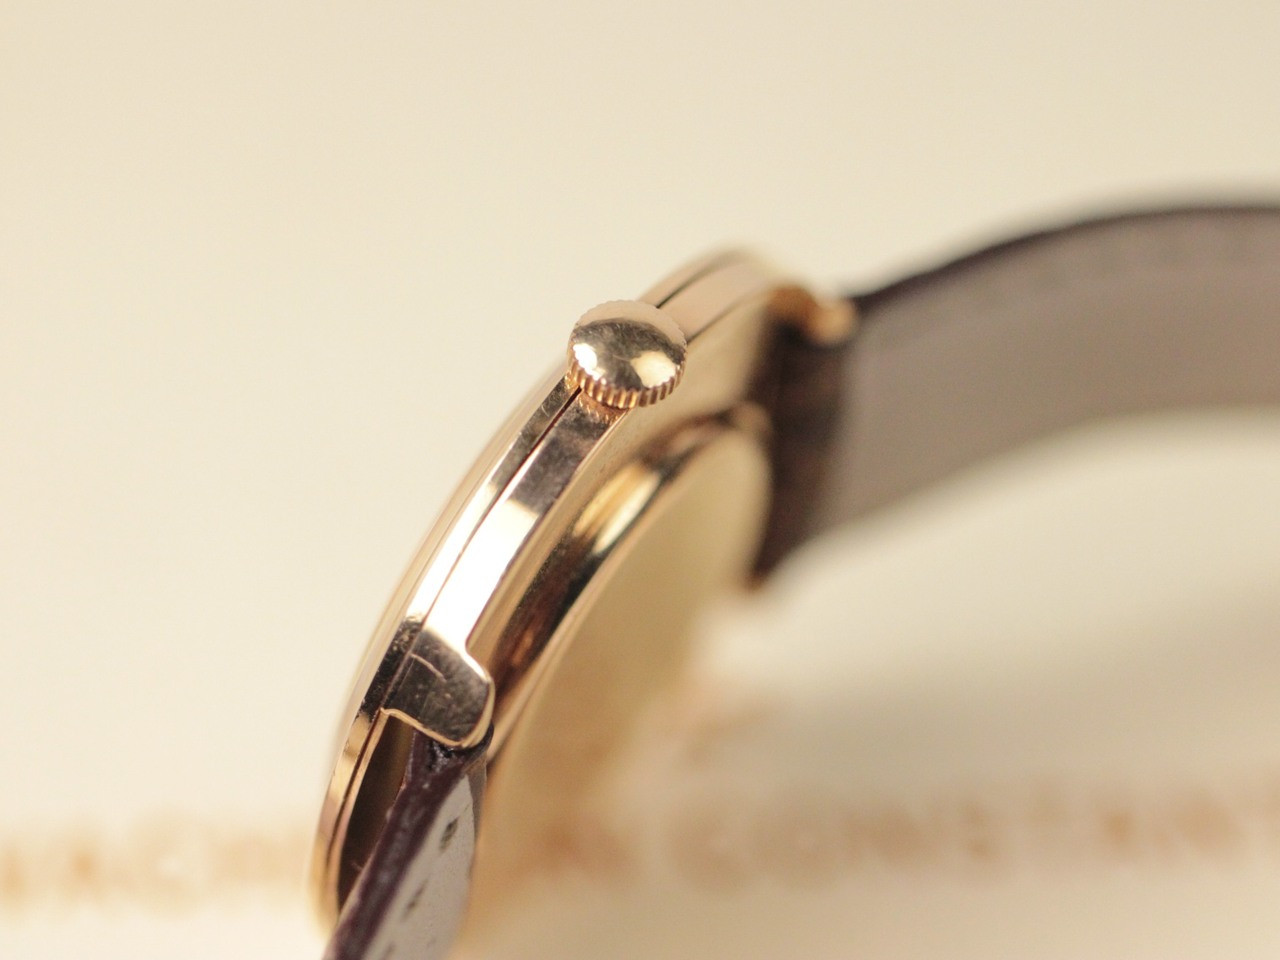 Rose Gold Case & Crown - Vintage Vacheron Constantin Vintage Gold Watch - www.Legendoftime.com - Chicago Watch Center